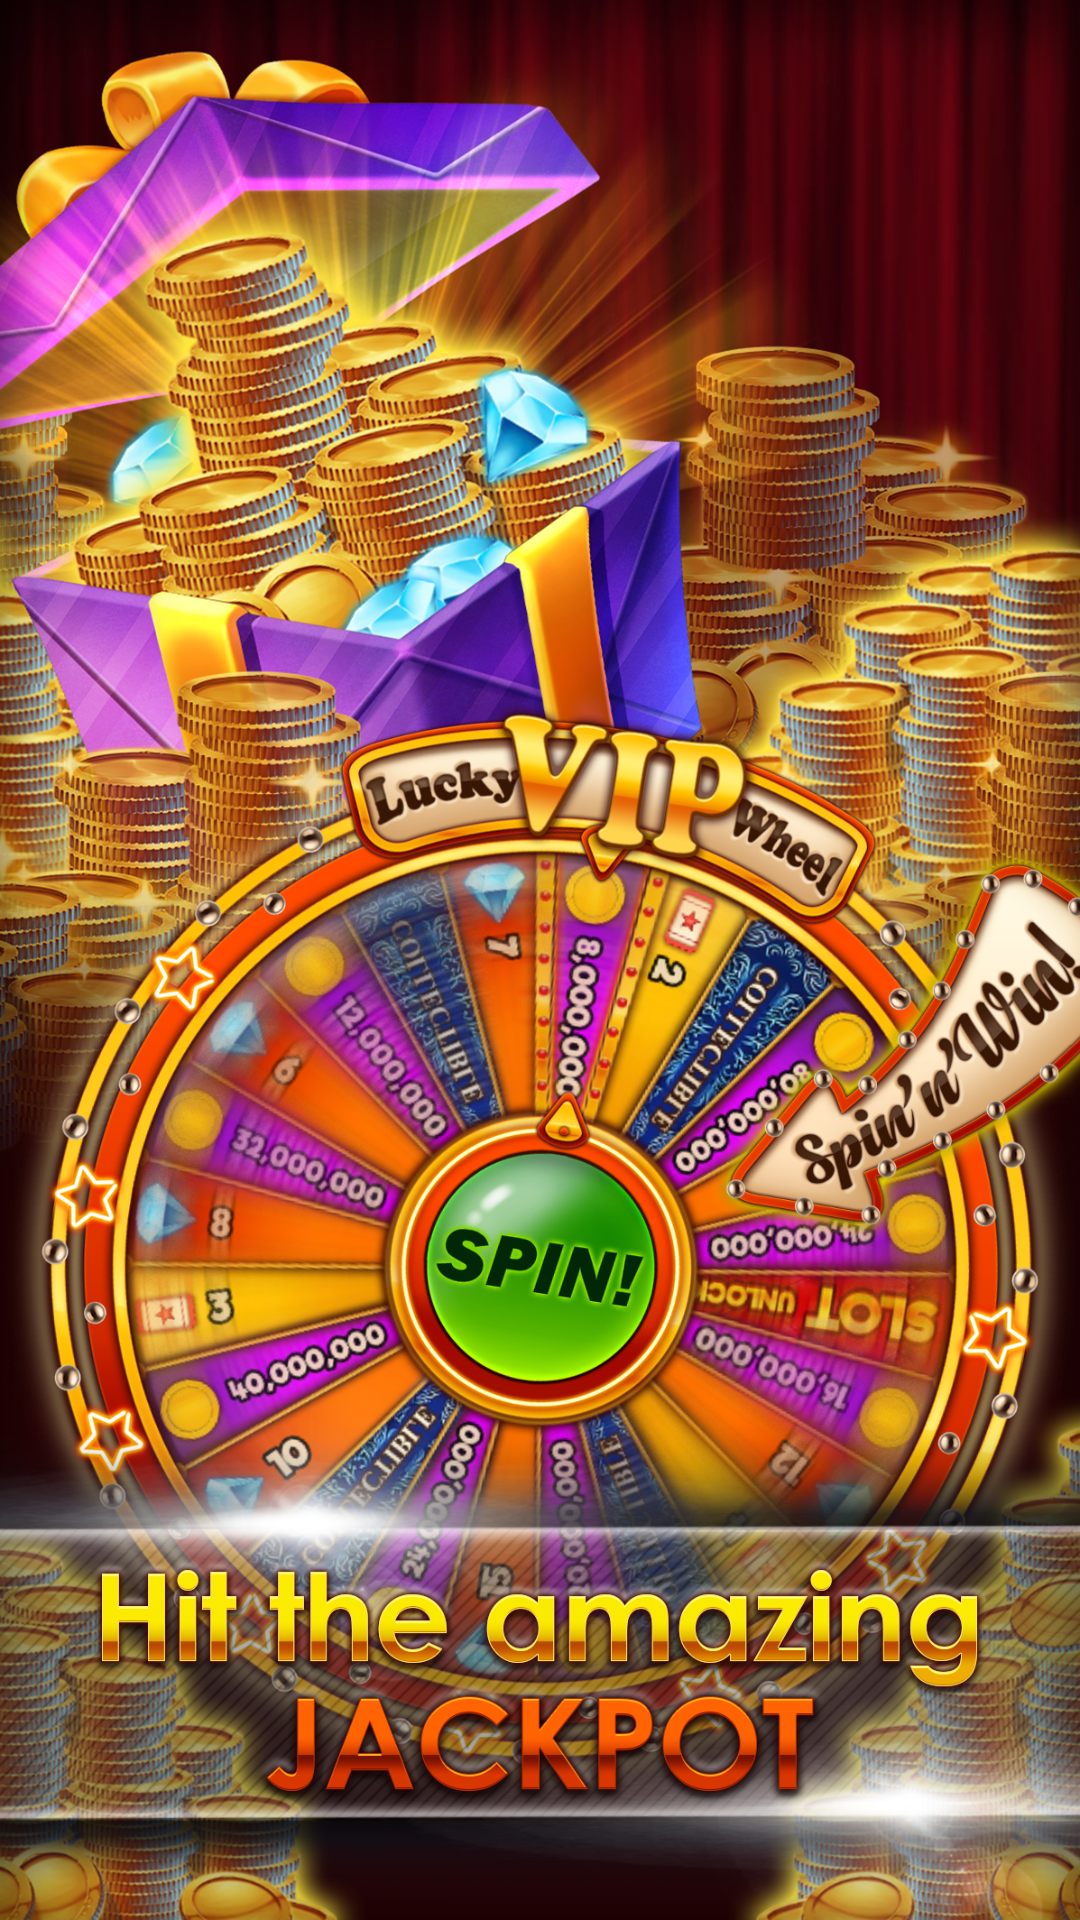 SLOTMAN - neu Slots Casino Spiele 2018: besten spielautomaten 777 ...